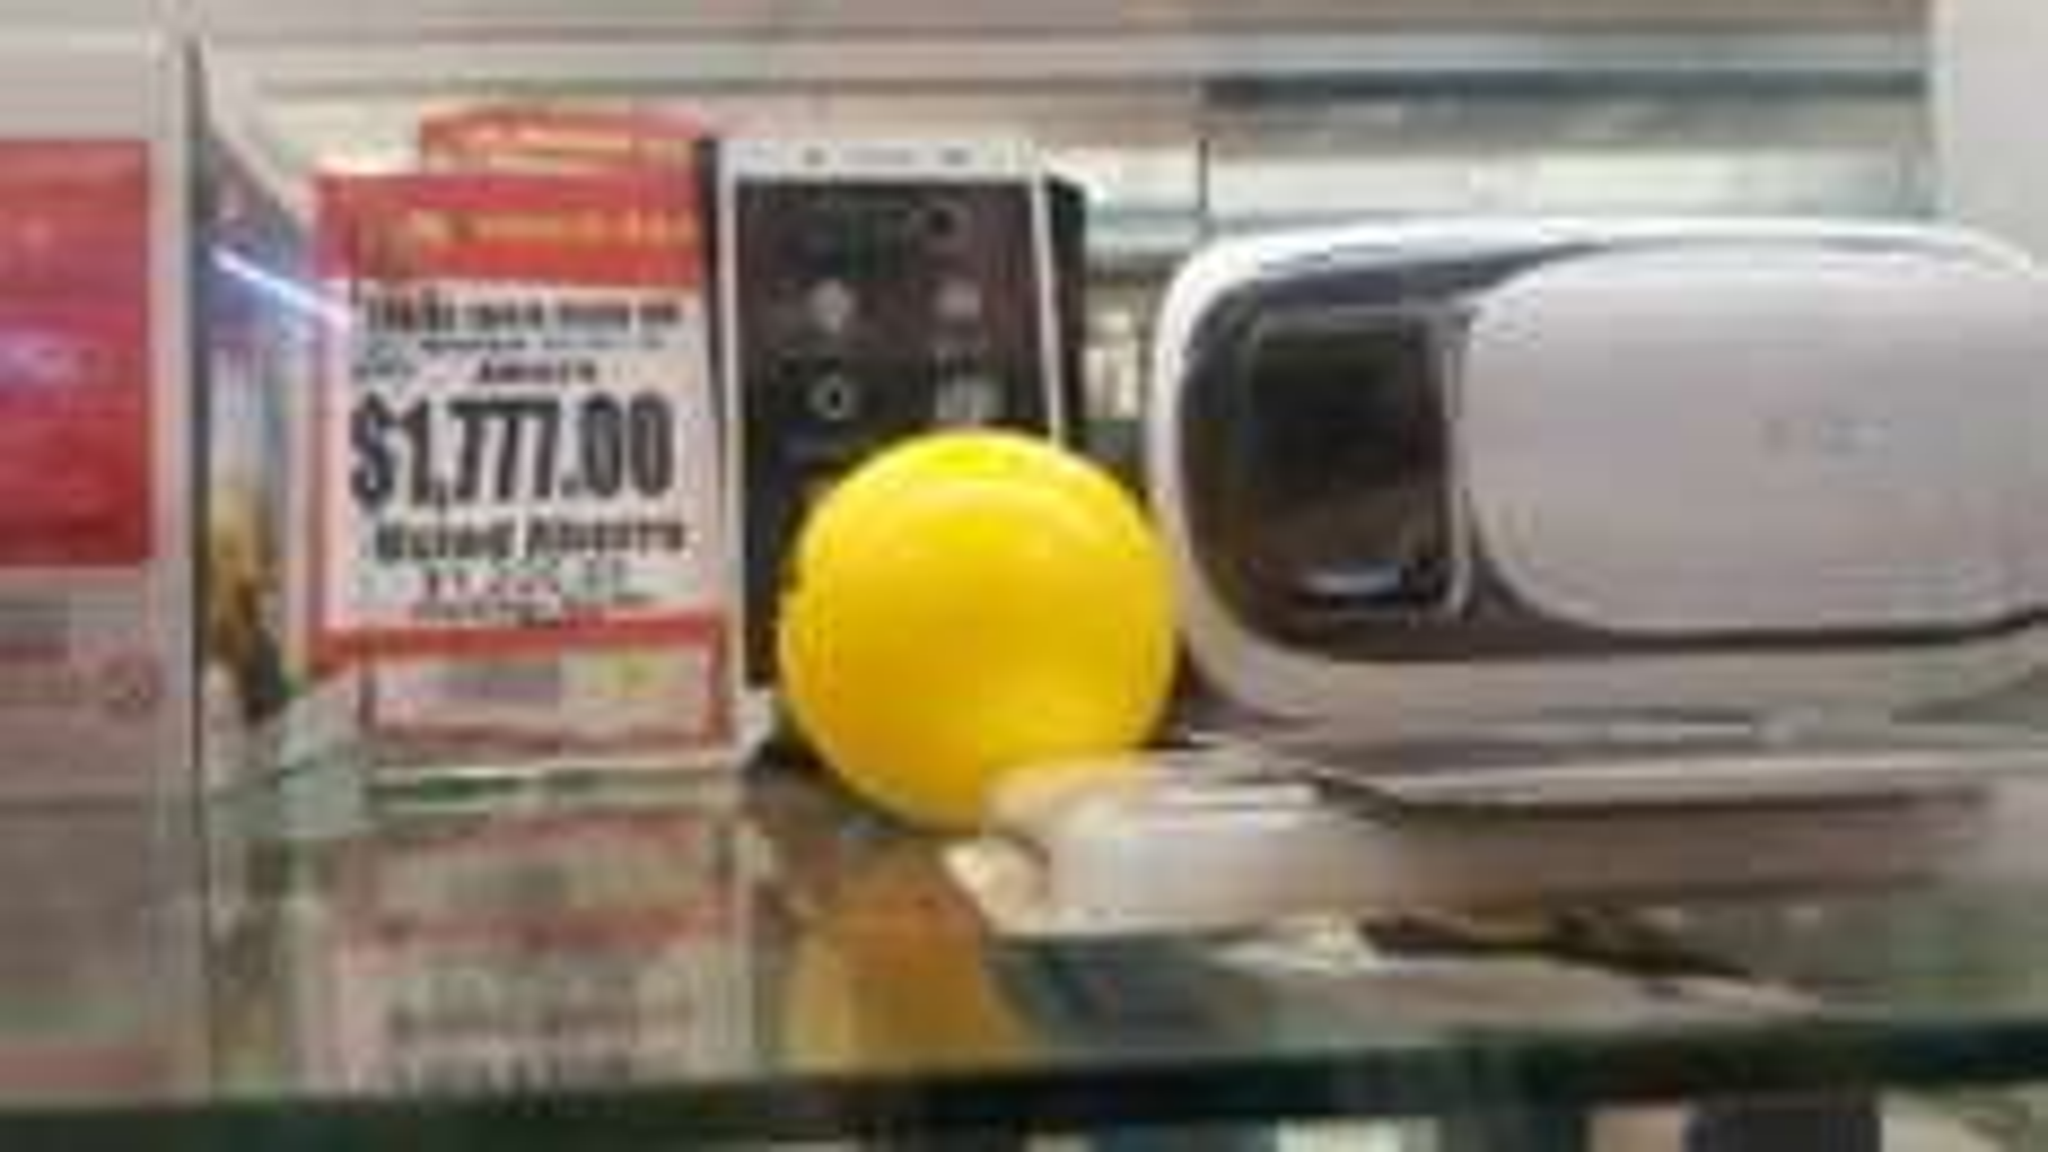 Walmart: Celular INCO Zero + Lentes VR + Carcasa rigida + Memoria de 8gb LIBRE